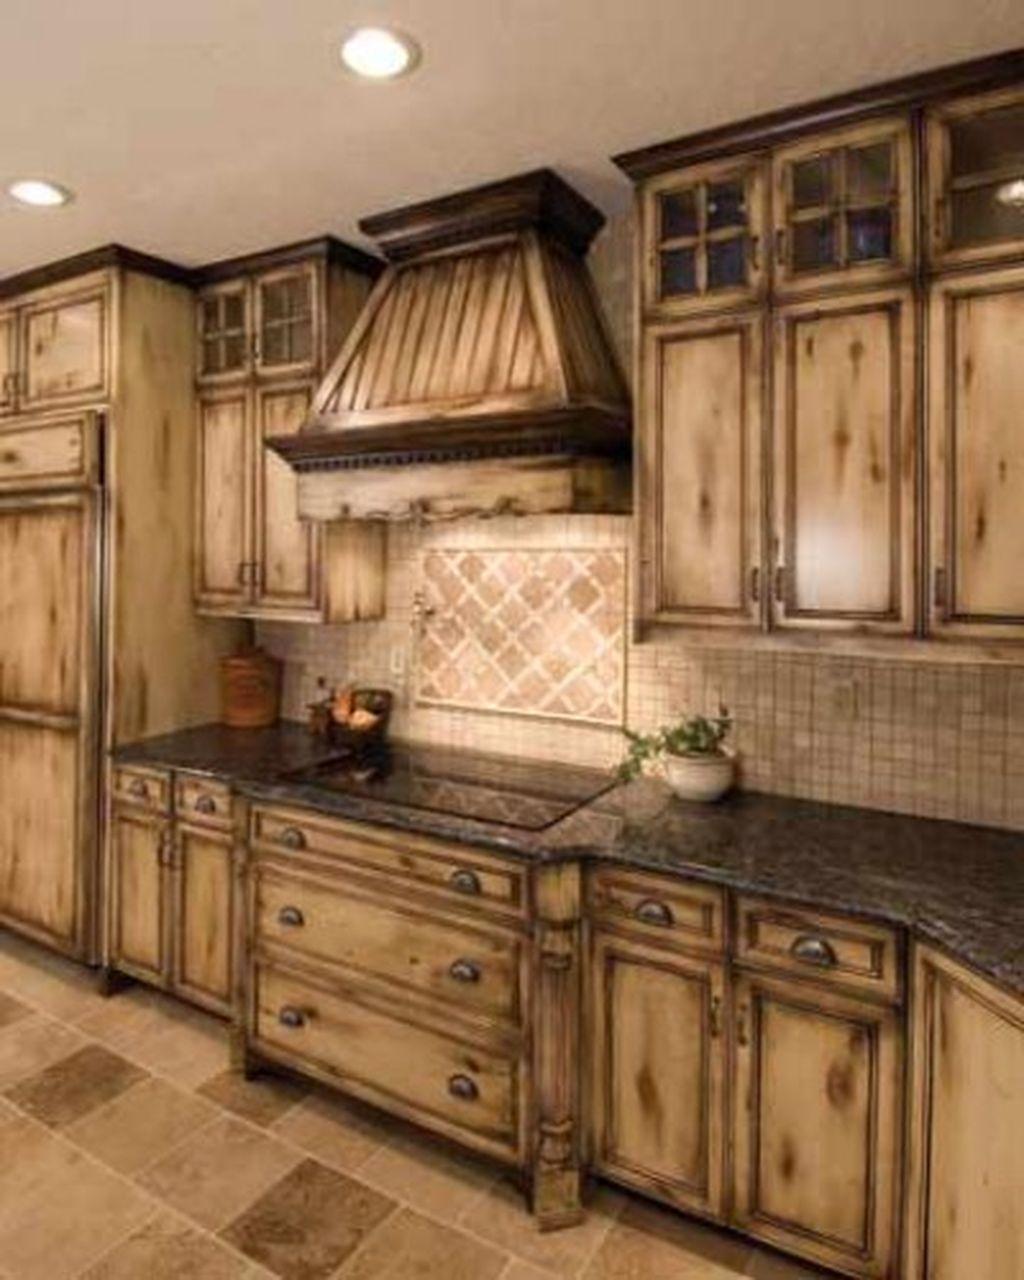 Beautiful Farmhouse Style Rustic Kitchen Cabinet Decoration Ideas 37 ...